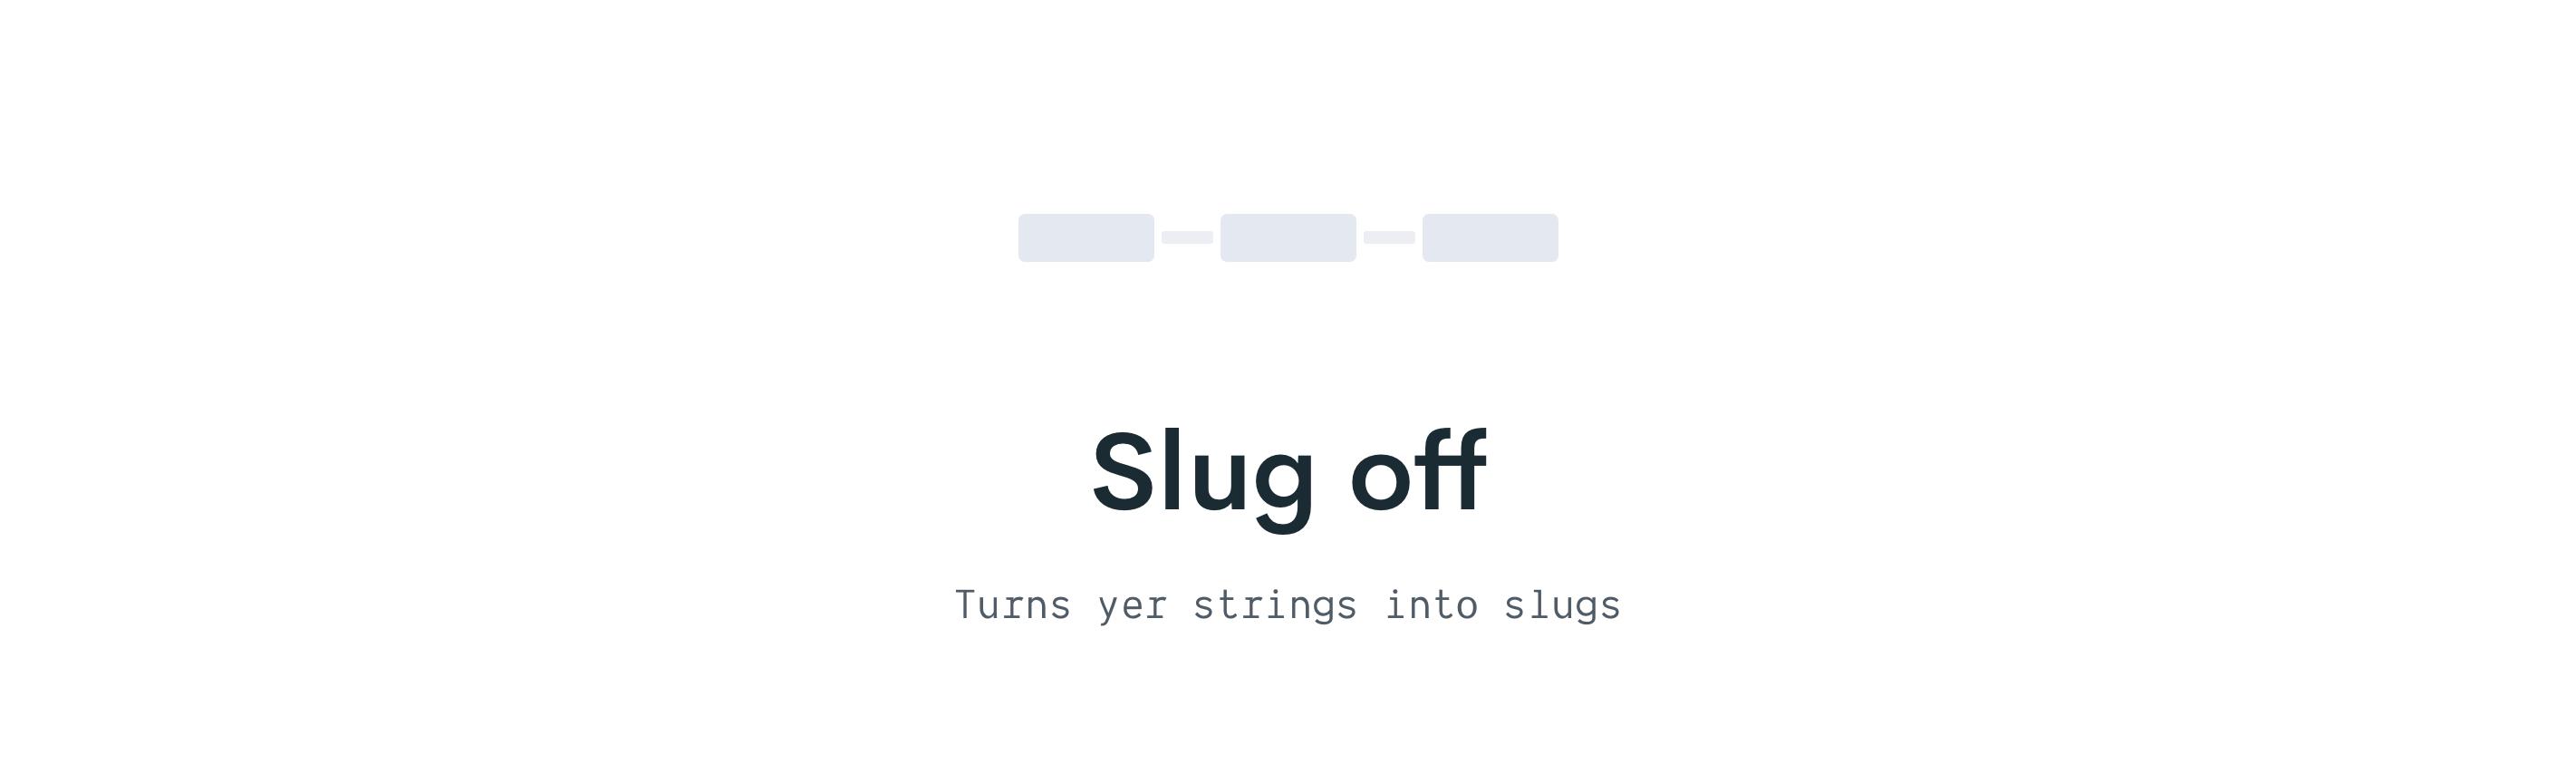 Slug off